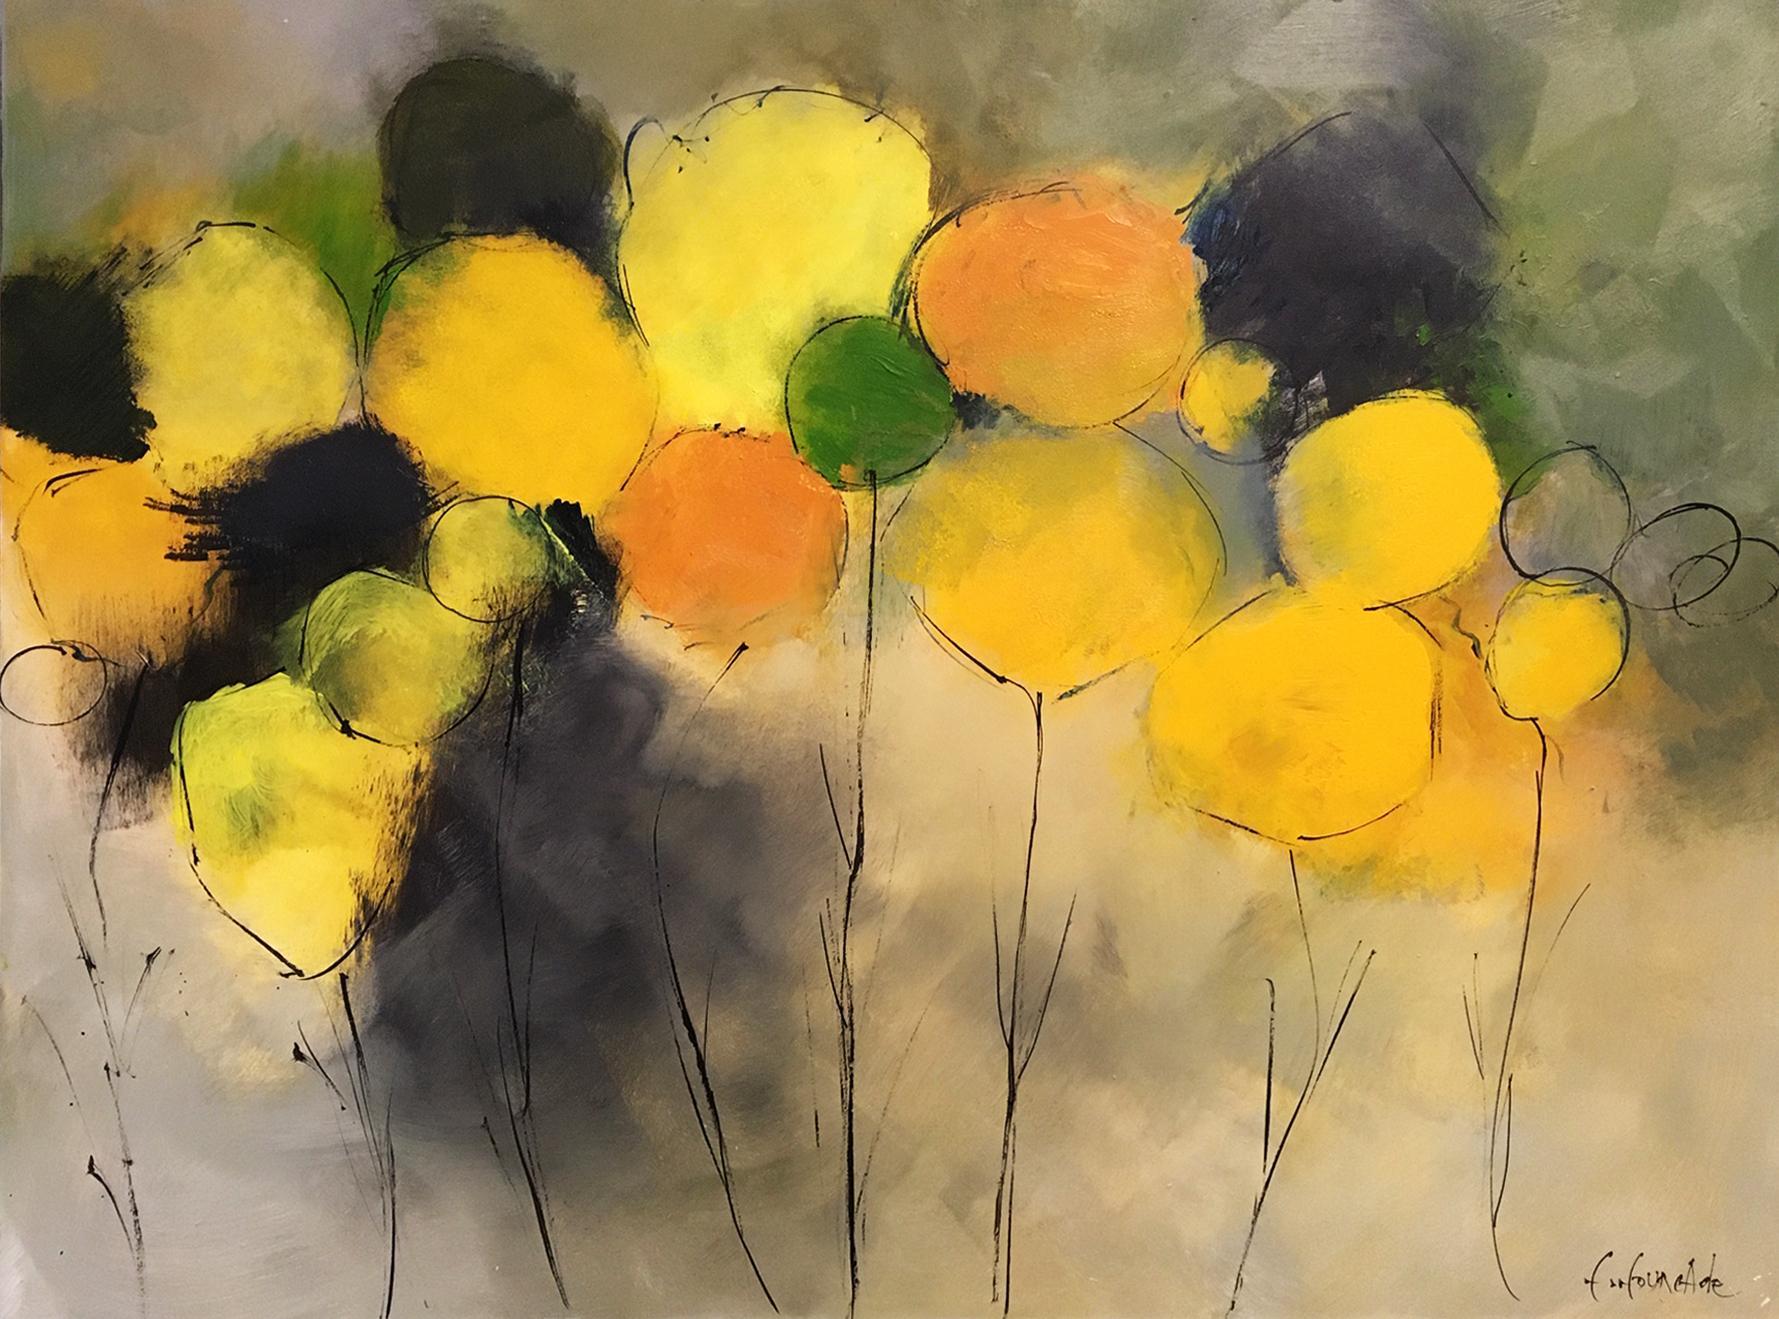 Boules jaunes